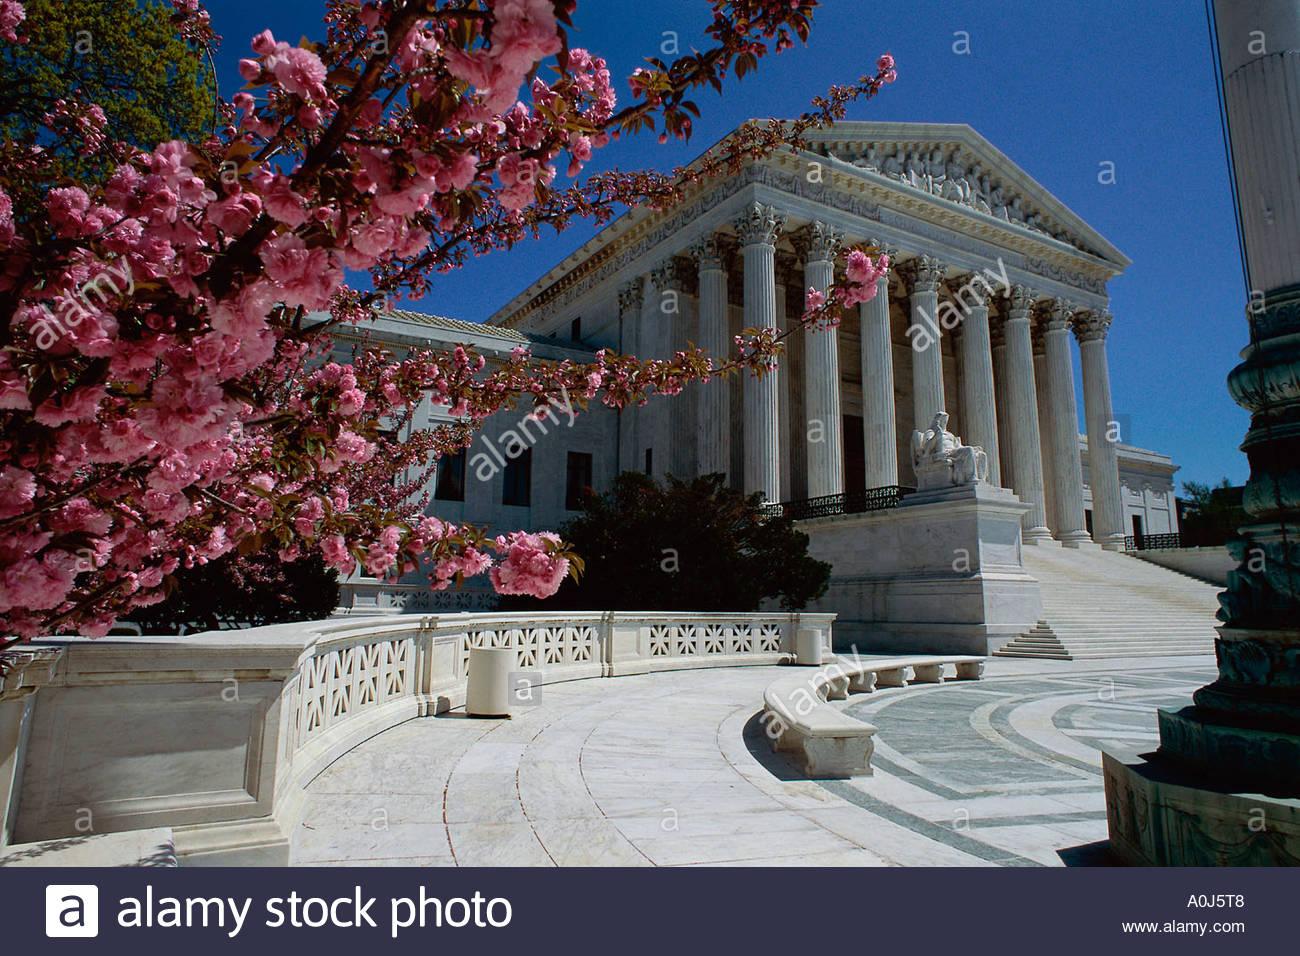 U.S. Supreme Court  Washington, D.C.  USA - Stock Image